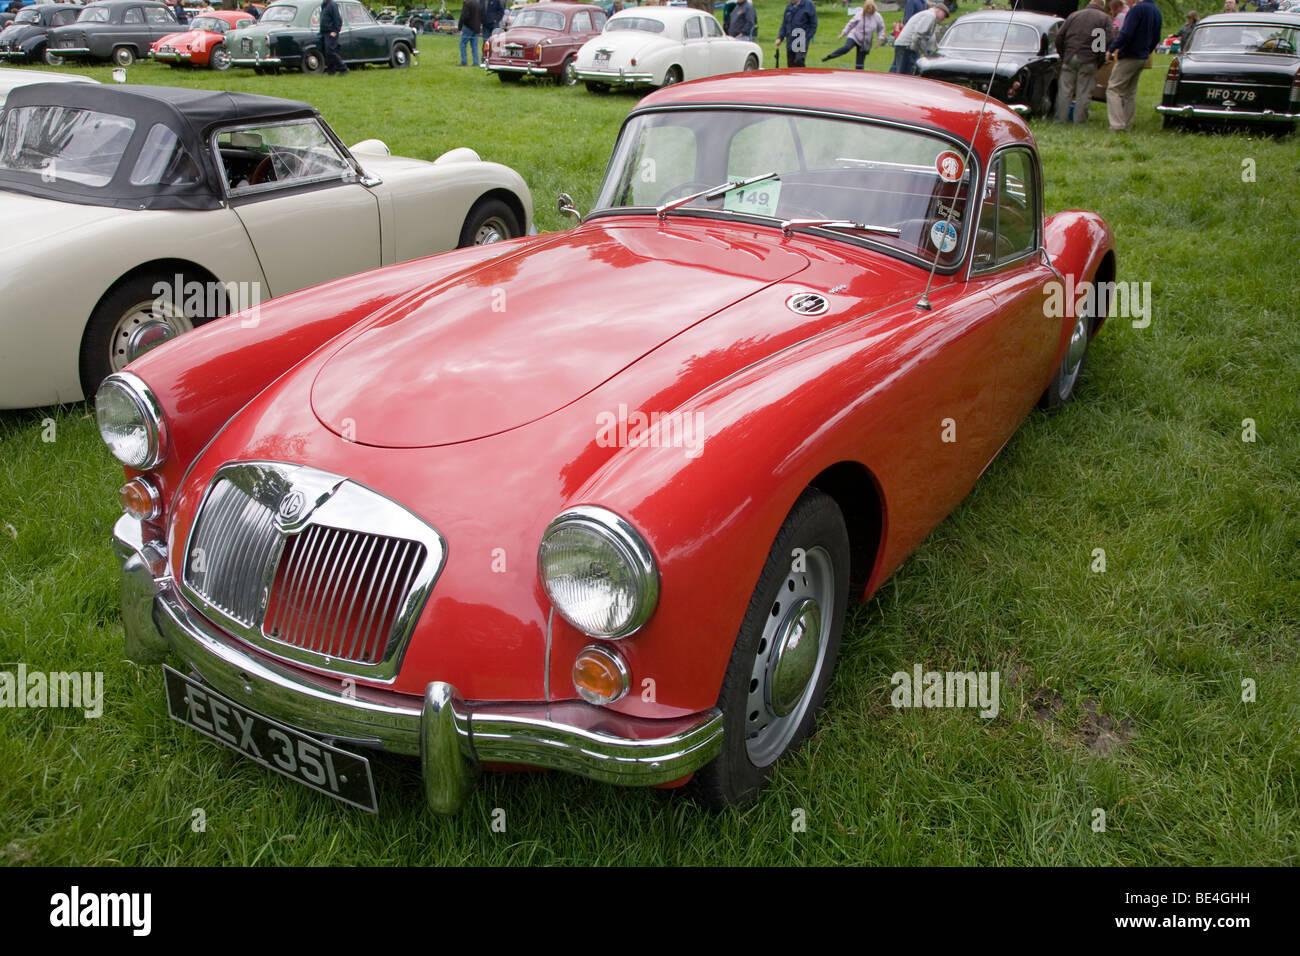 1960 MGA Coupe am historischen Autofahren Extravaganza 2009 Scottish Borders Stockbild